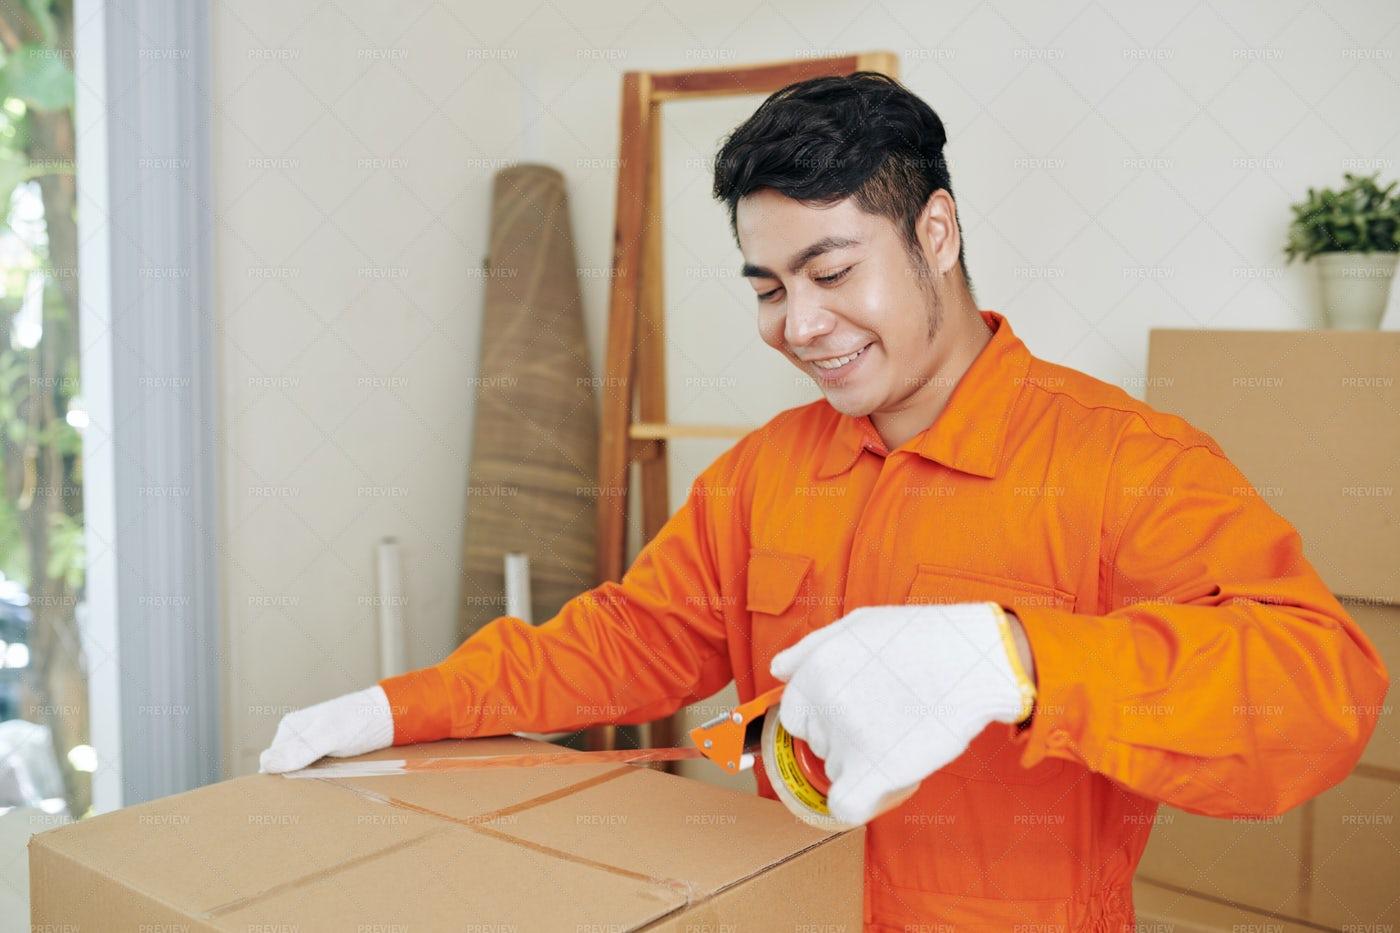 Smiling Worker Sealing Boxes: Stock Photos